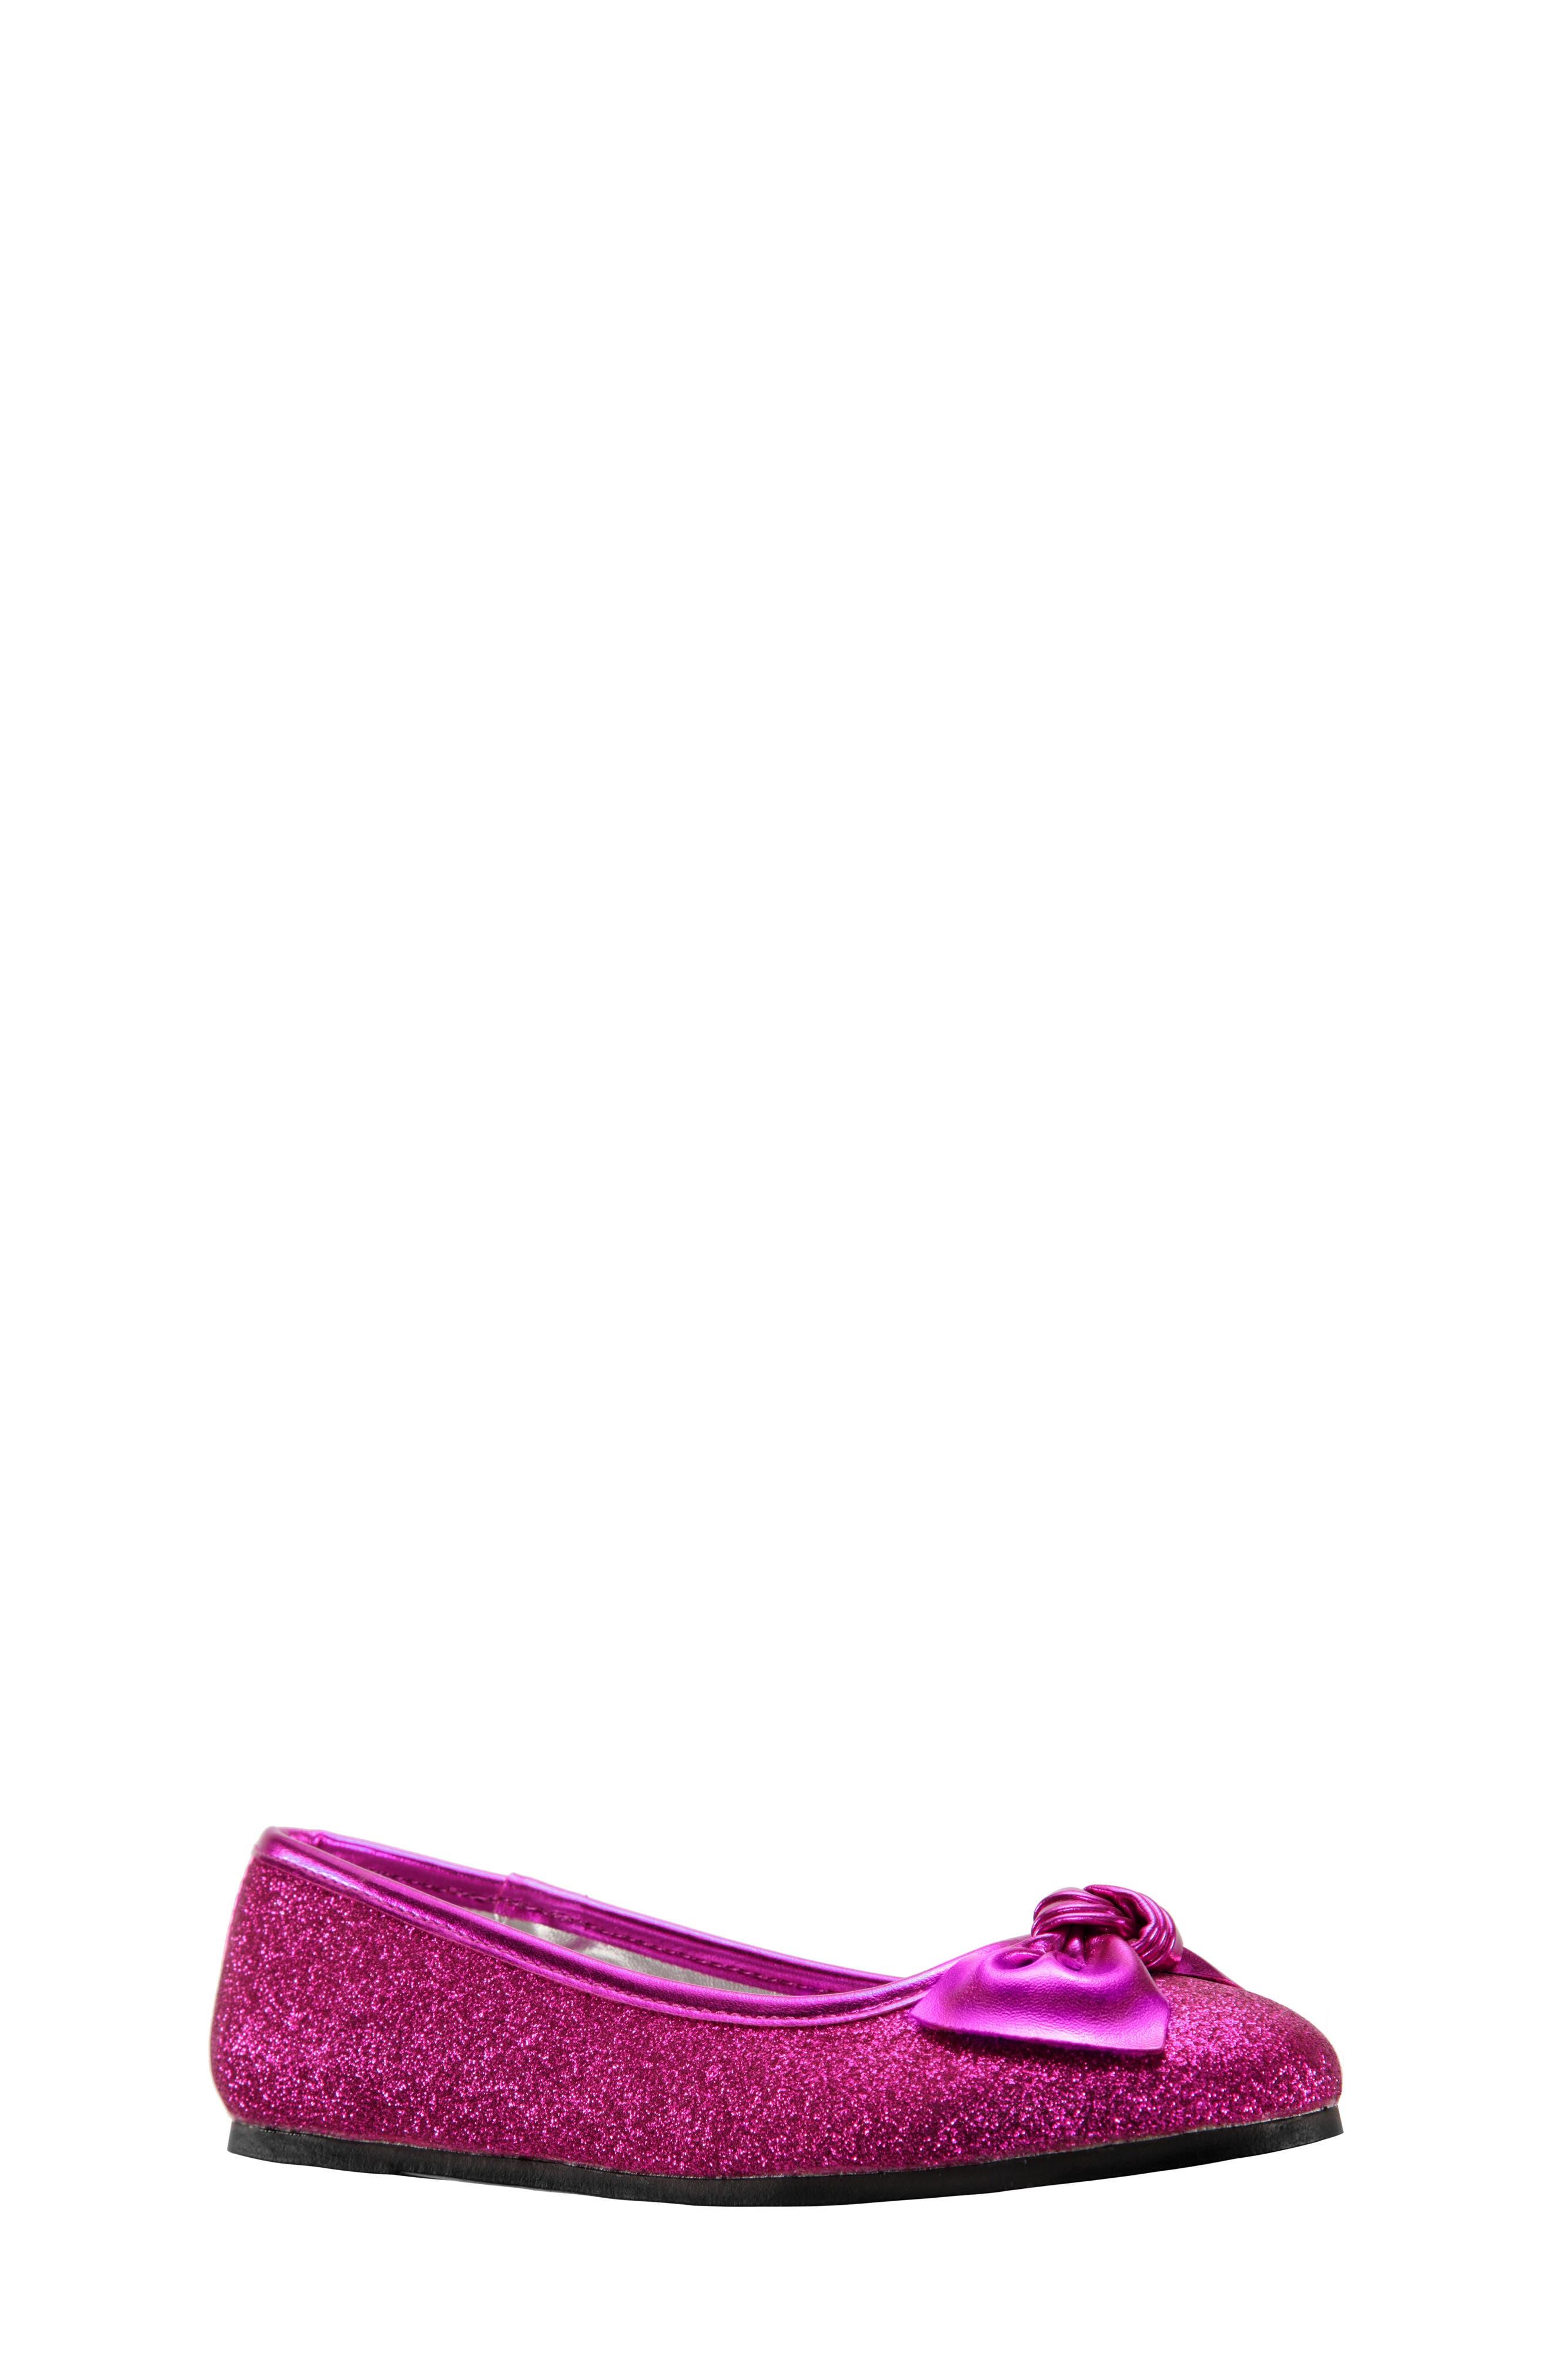 Larabeth Glitter Ballet Flat,                             Main thumbnail 1, color,                             Berry Metallic/ Glitter